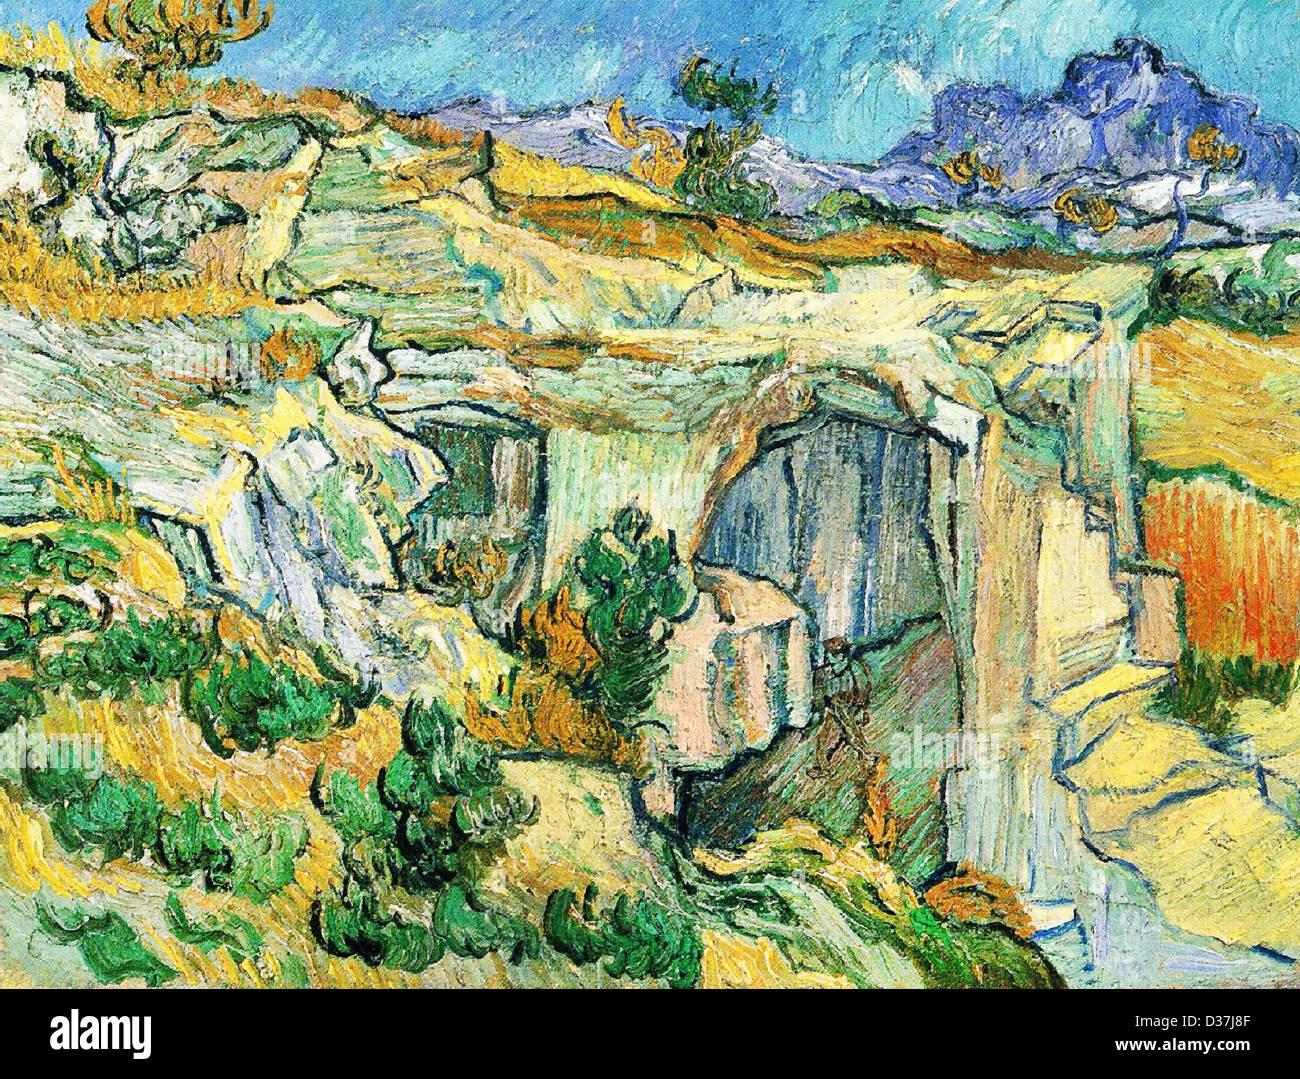 Vincent van Gogh, Entrance to a Quarry near Saint Remy. 1889. Post-Impressionism. Oil on canvas. - Stock Image